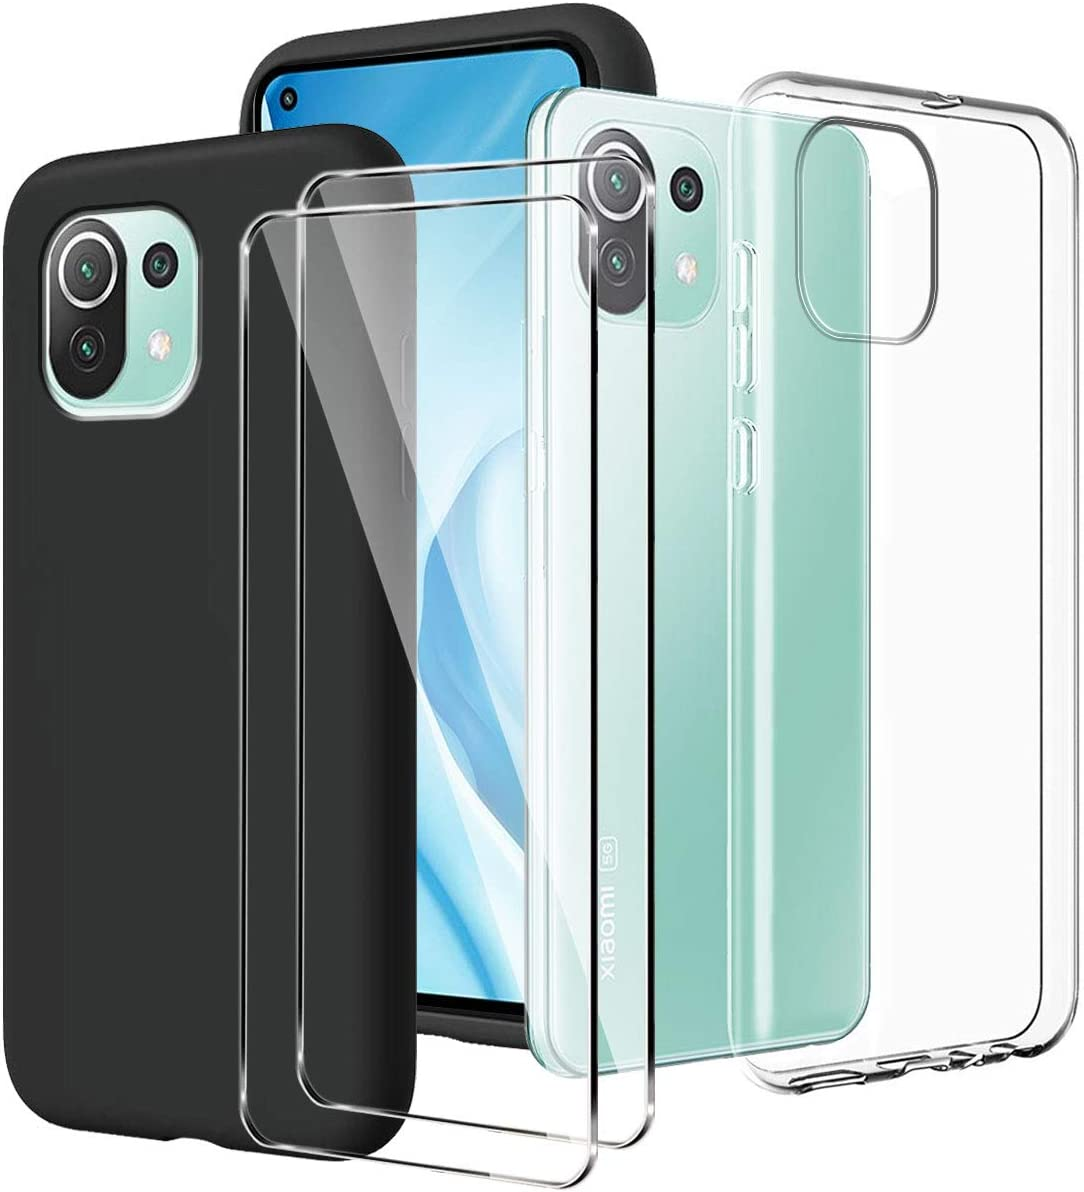 LYZXMY Funda para Xiaomi Mi 11 Lite 5G / 4G Transparente + Negro Carcasa + [2 Piezas] Vidrio Templado Película Protectora - Silicona TPU Suave Caso Case para Xiaomi Mi 11 Lite (6.55